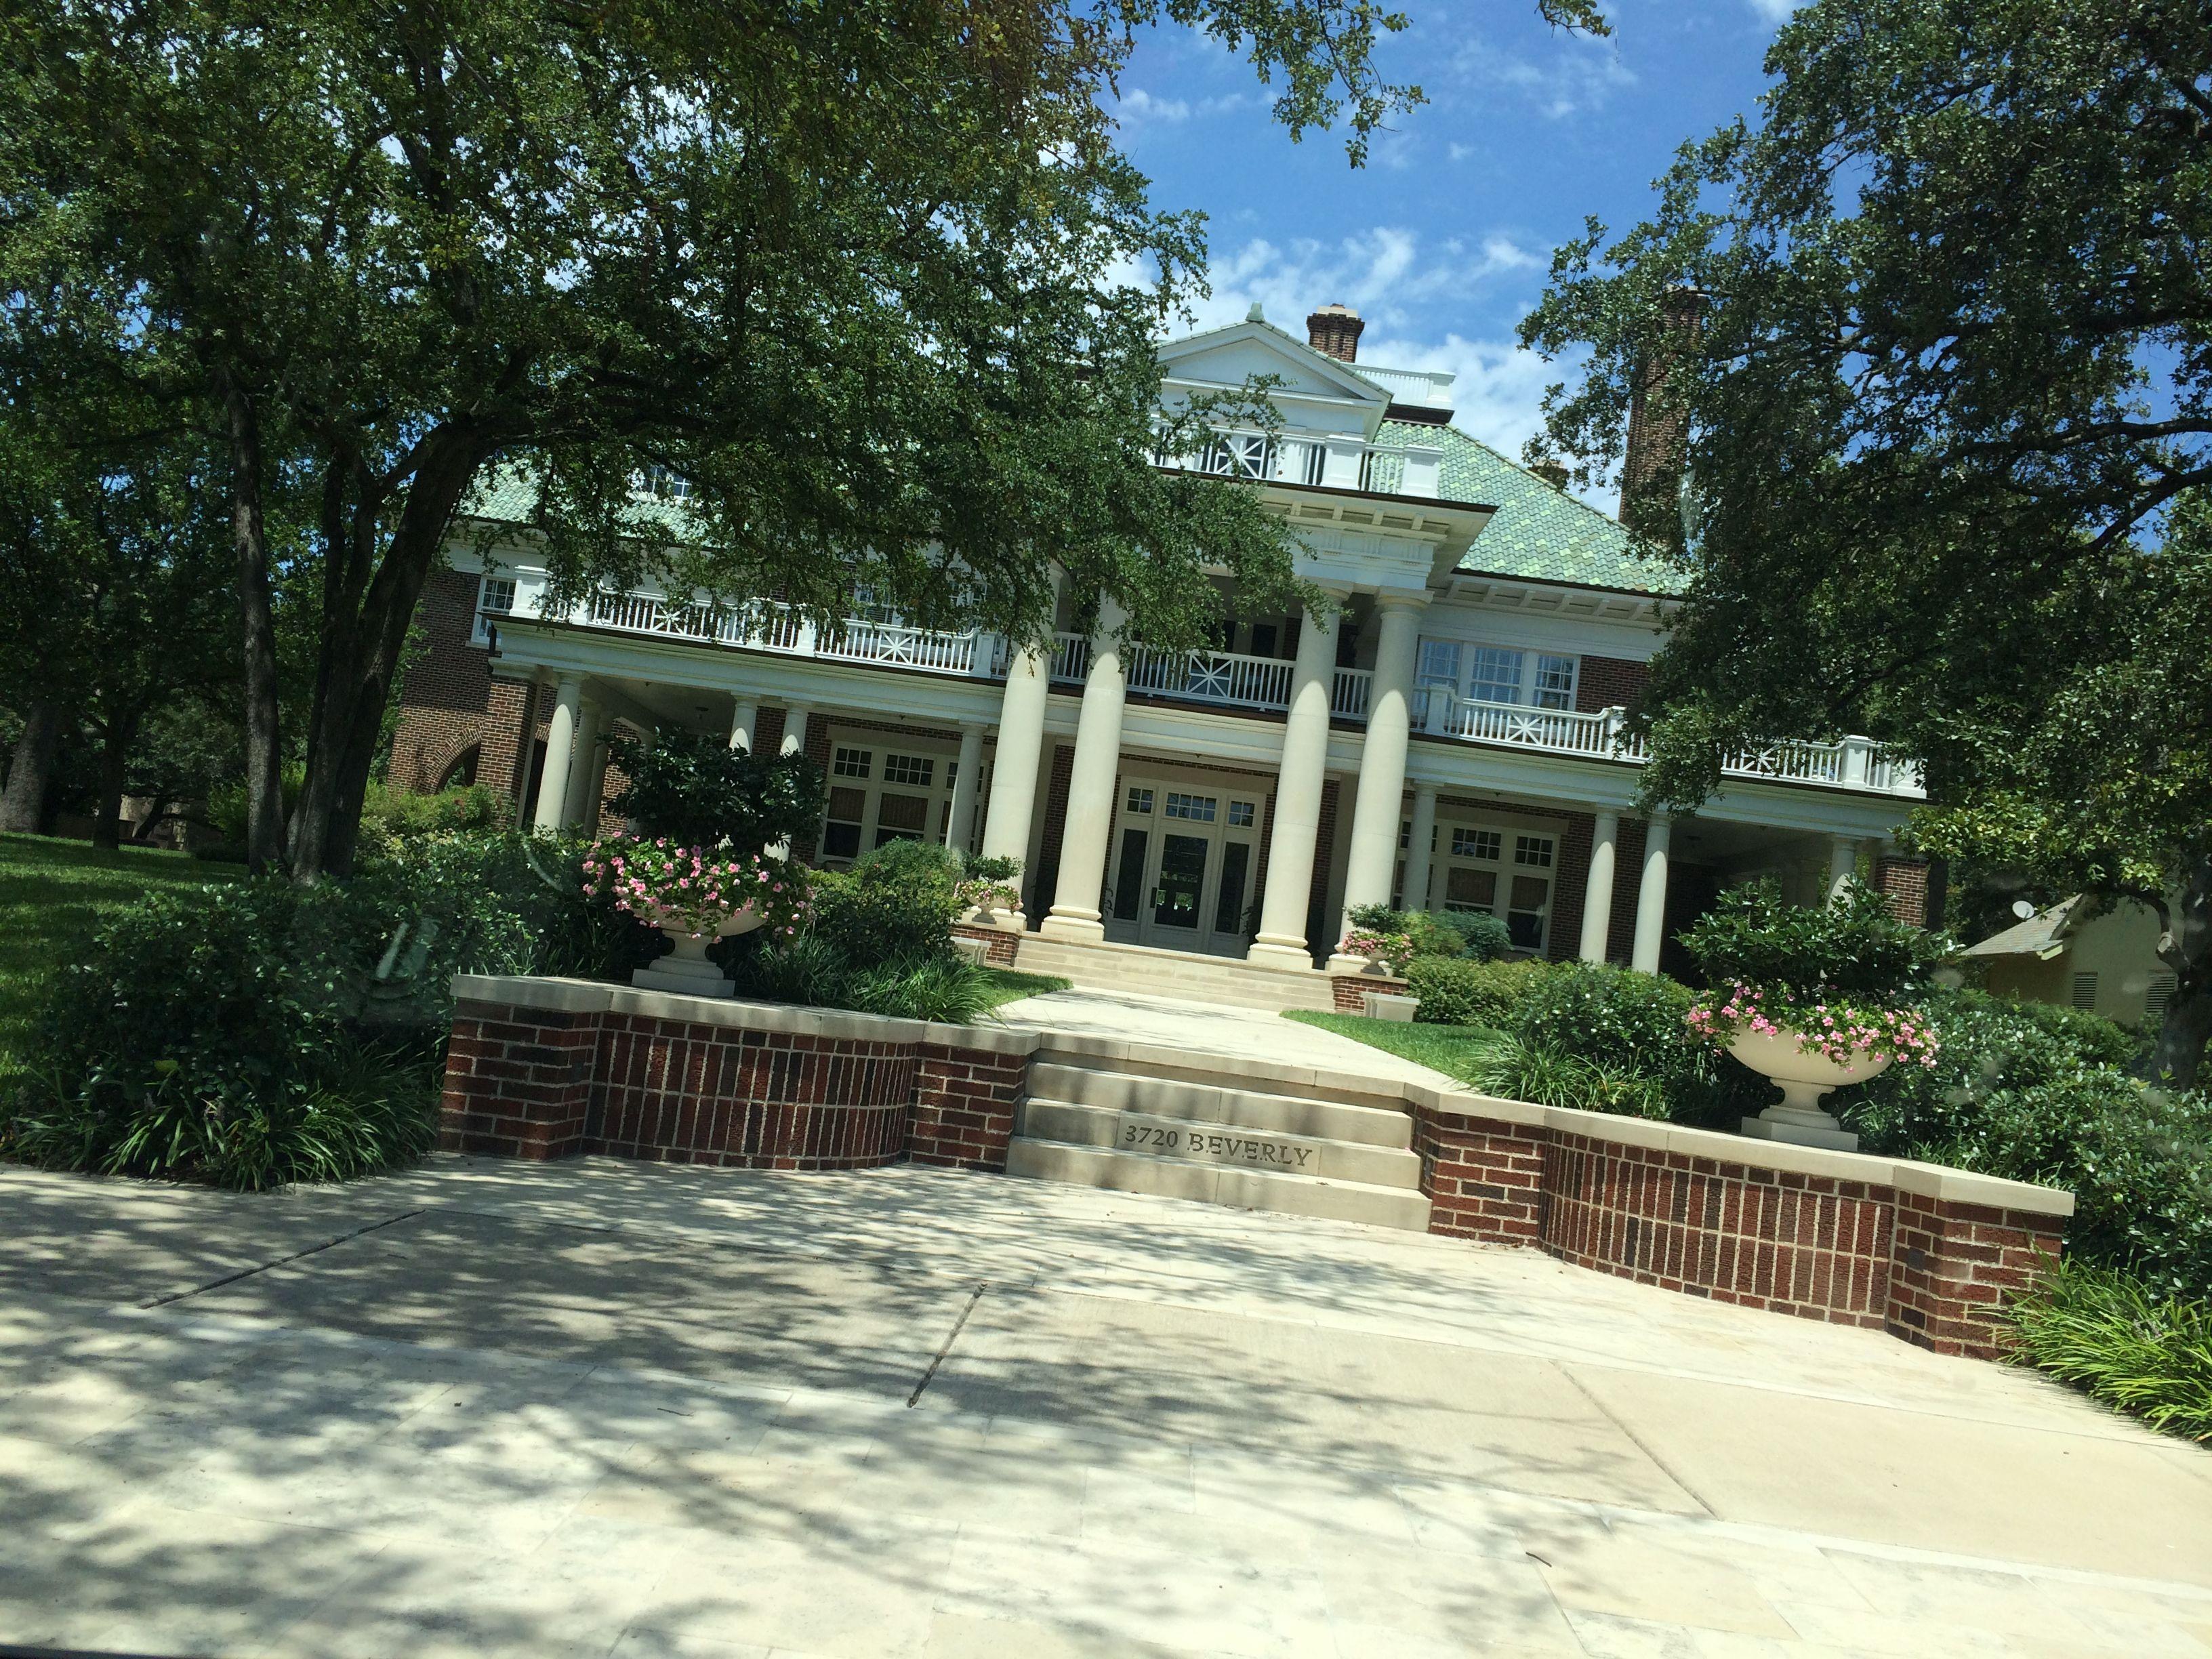 HighlandPark in Dallas has some great houses! Dallas